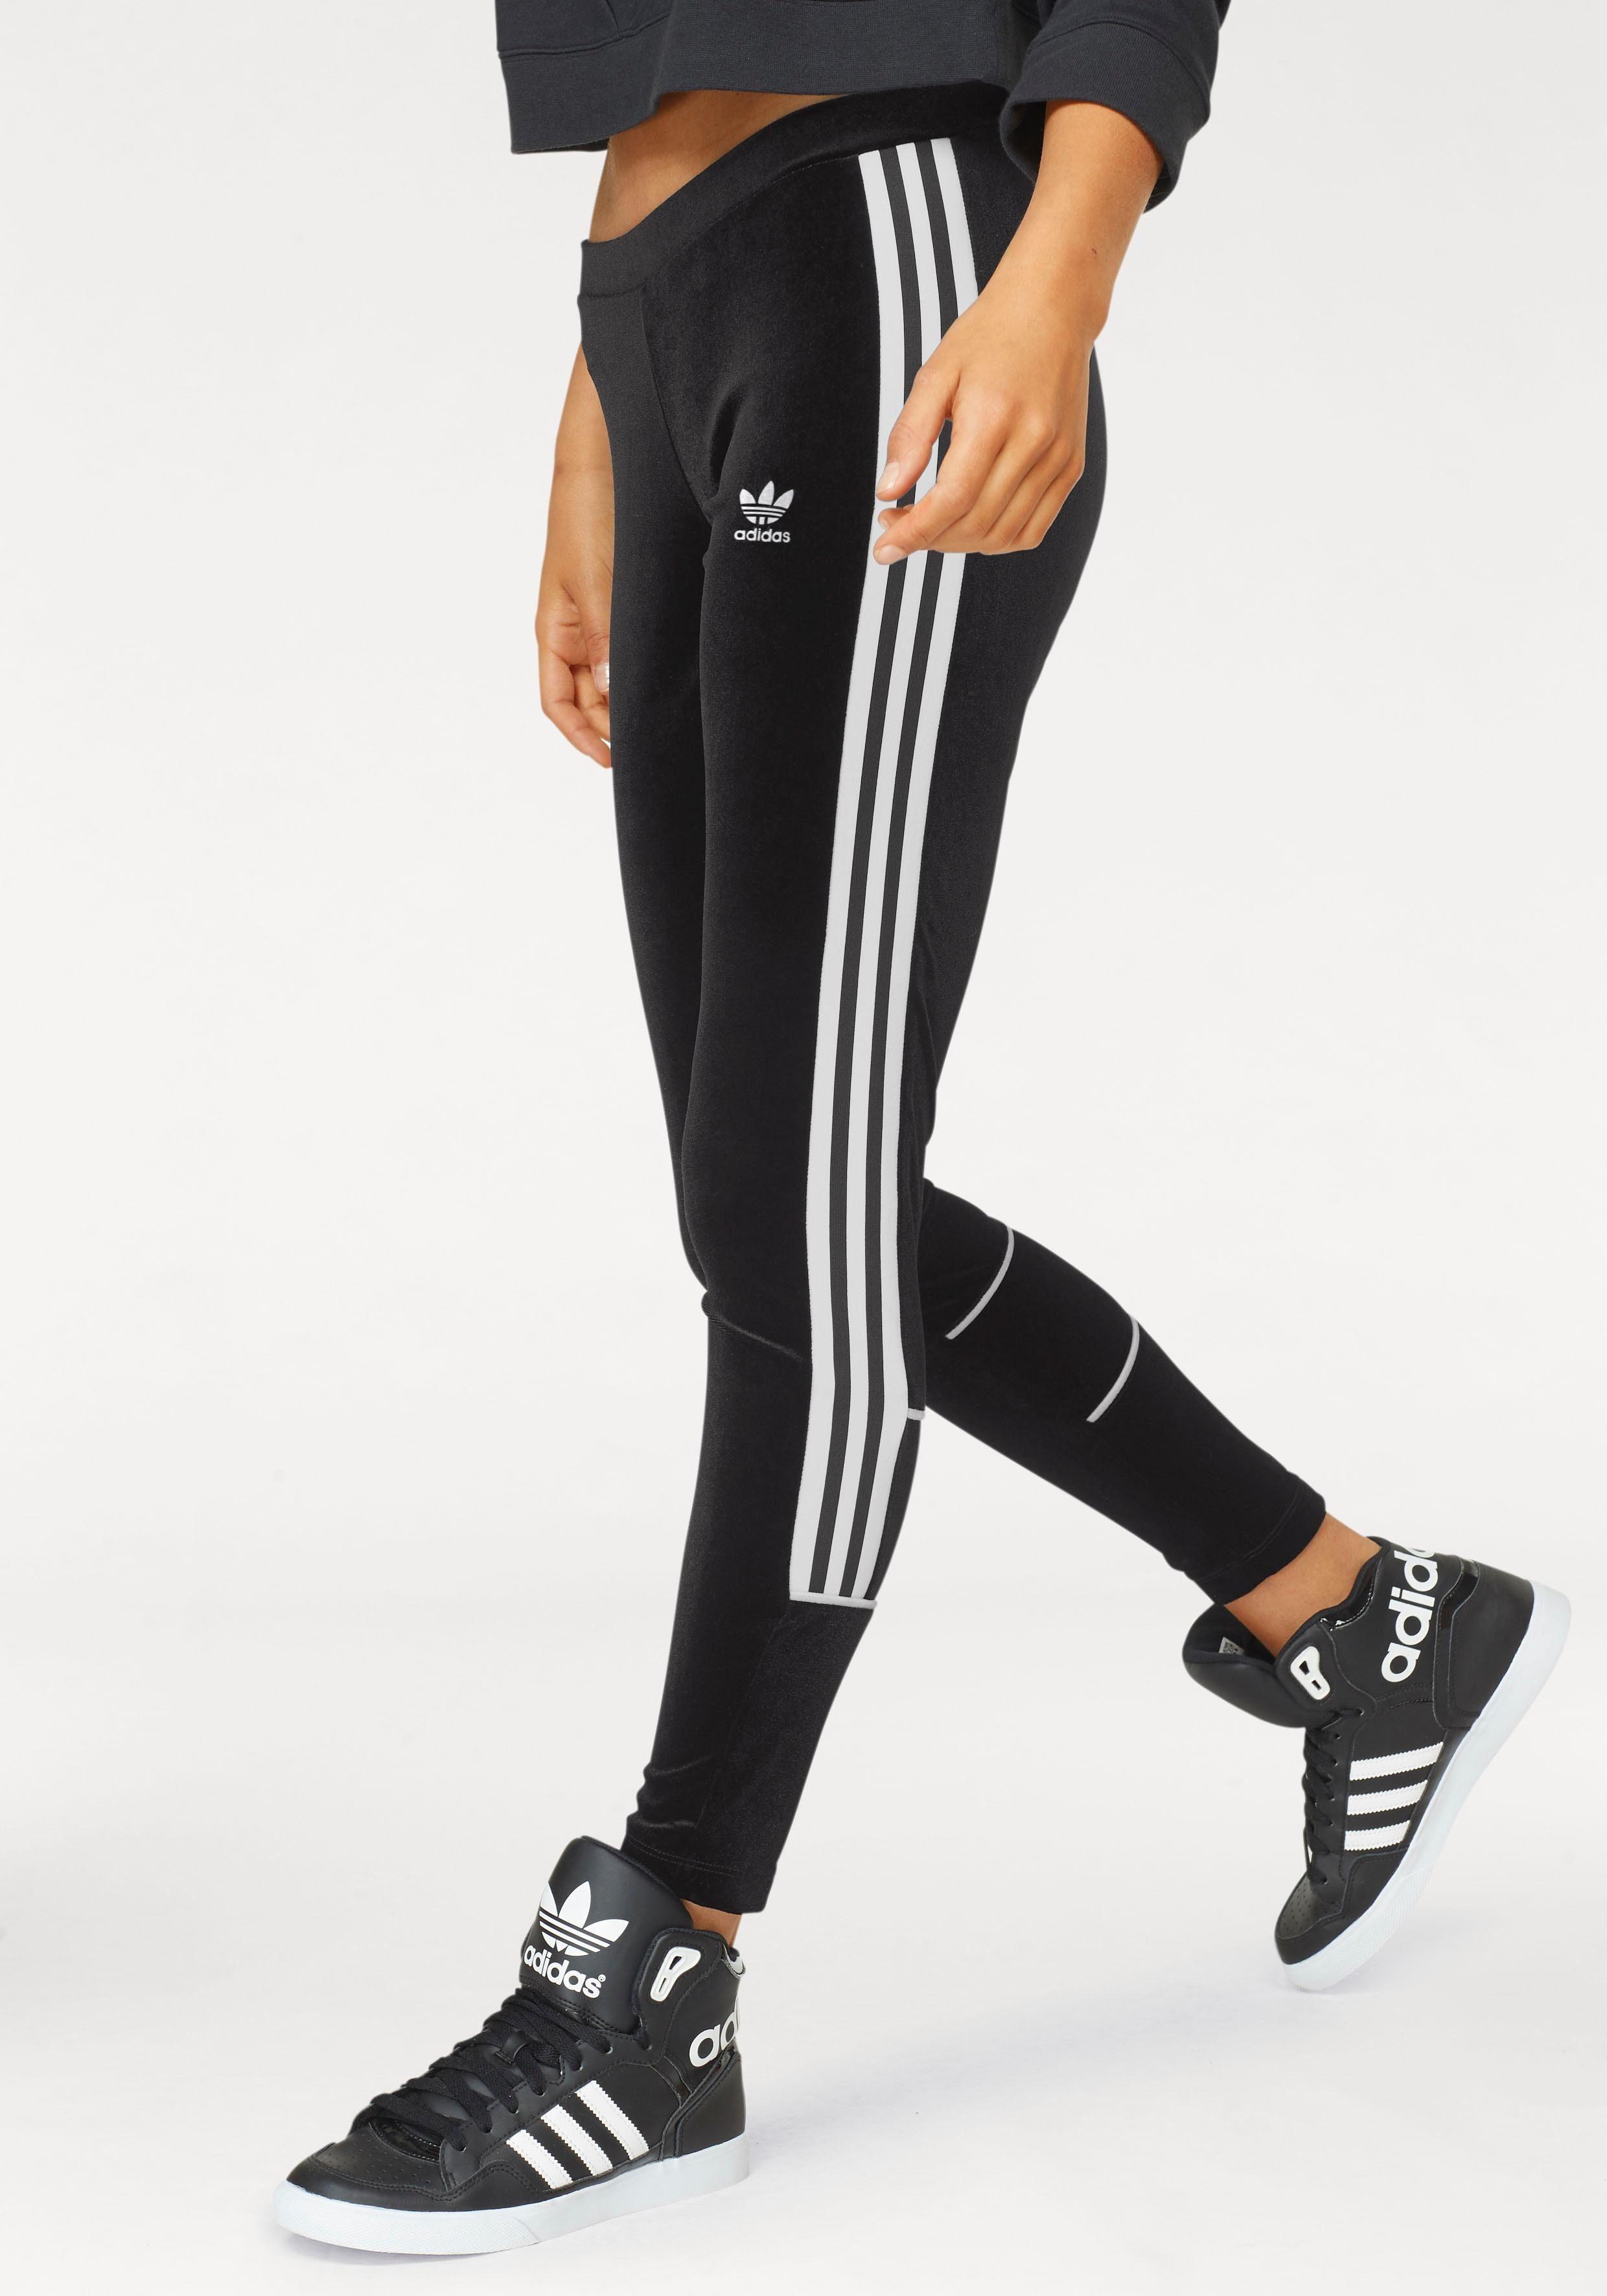 adidas Originals Nickihose »Leggings« kaufen | OTTO